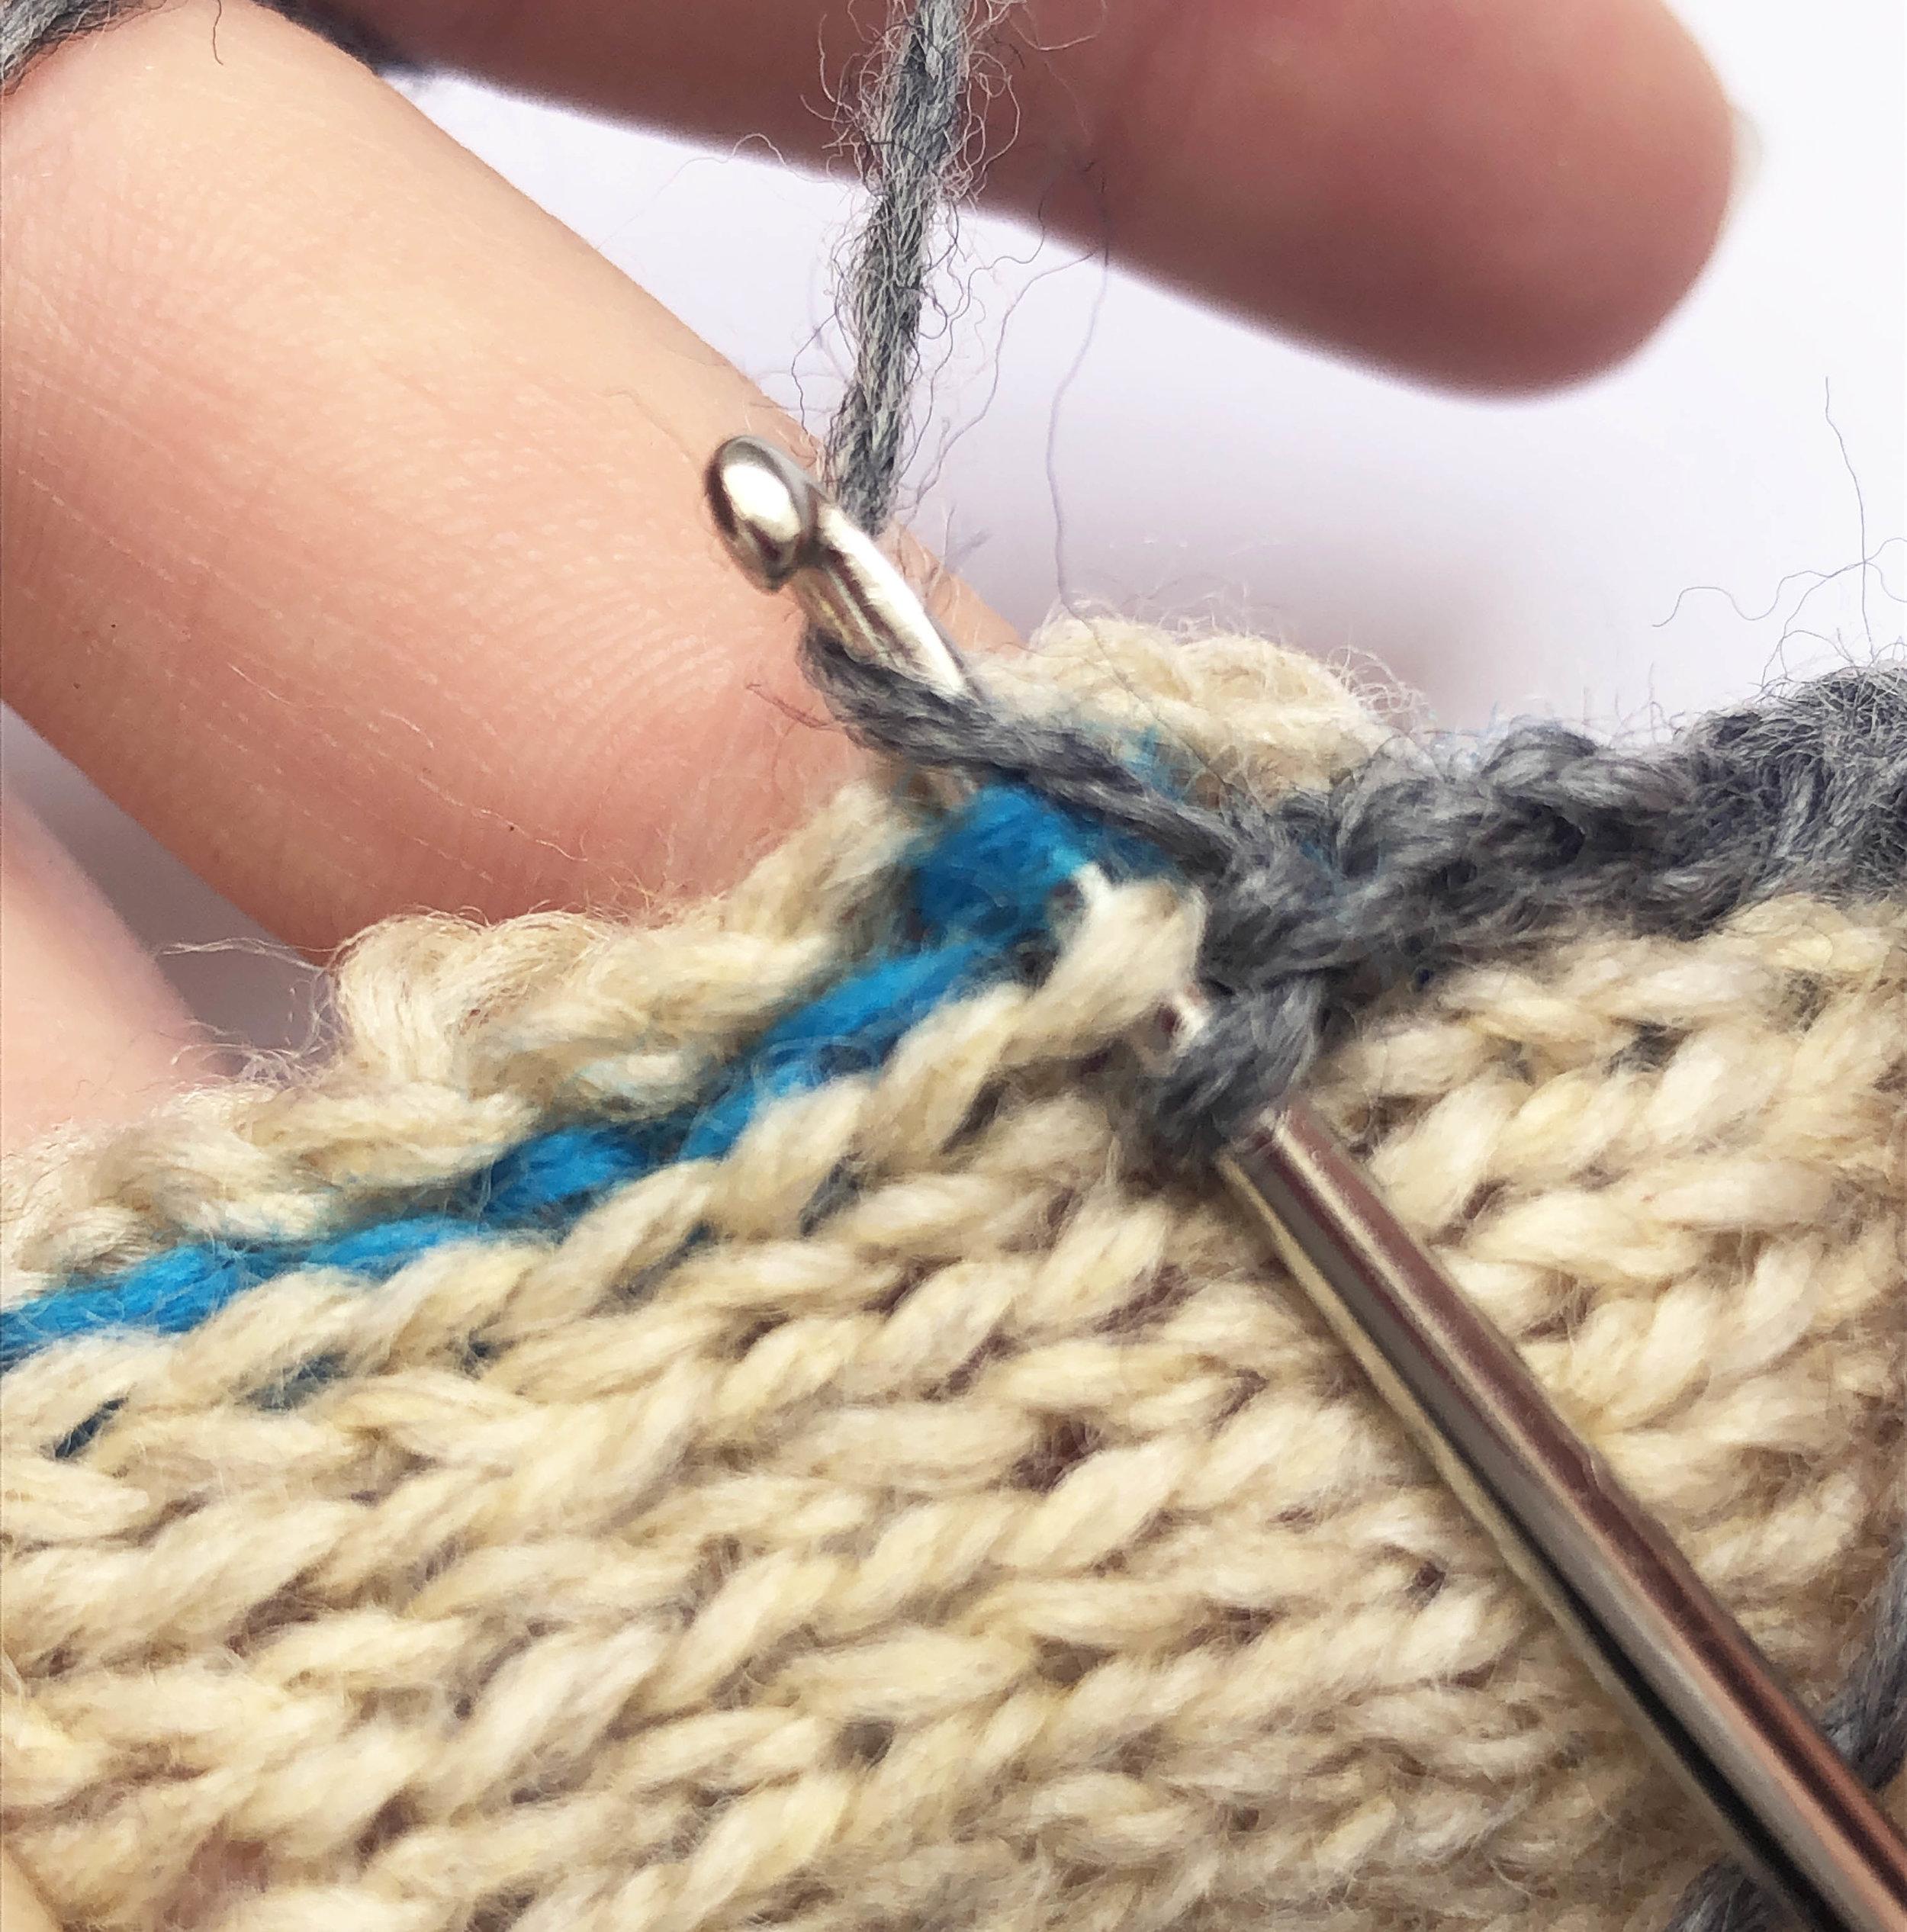 merele back stitch steek 47.jpg